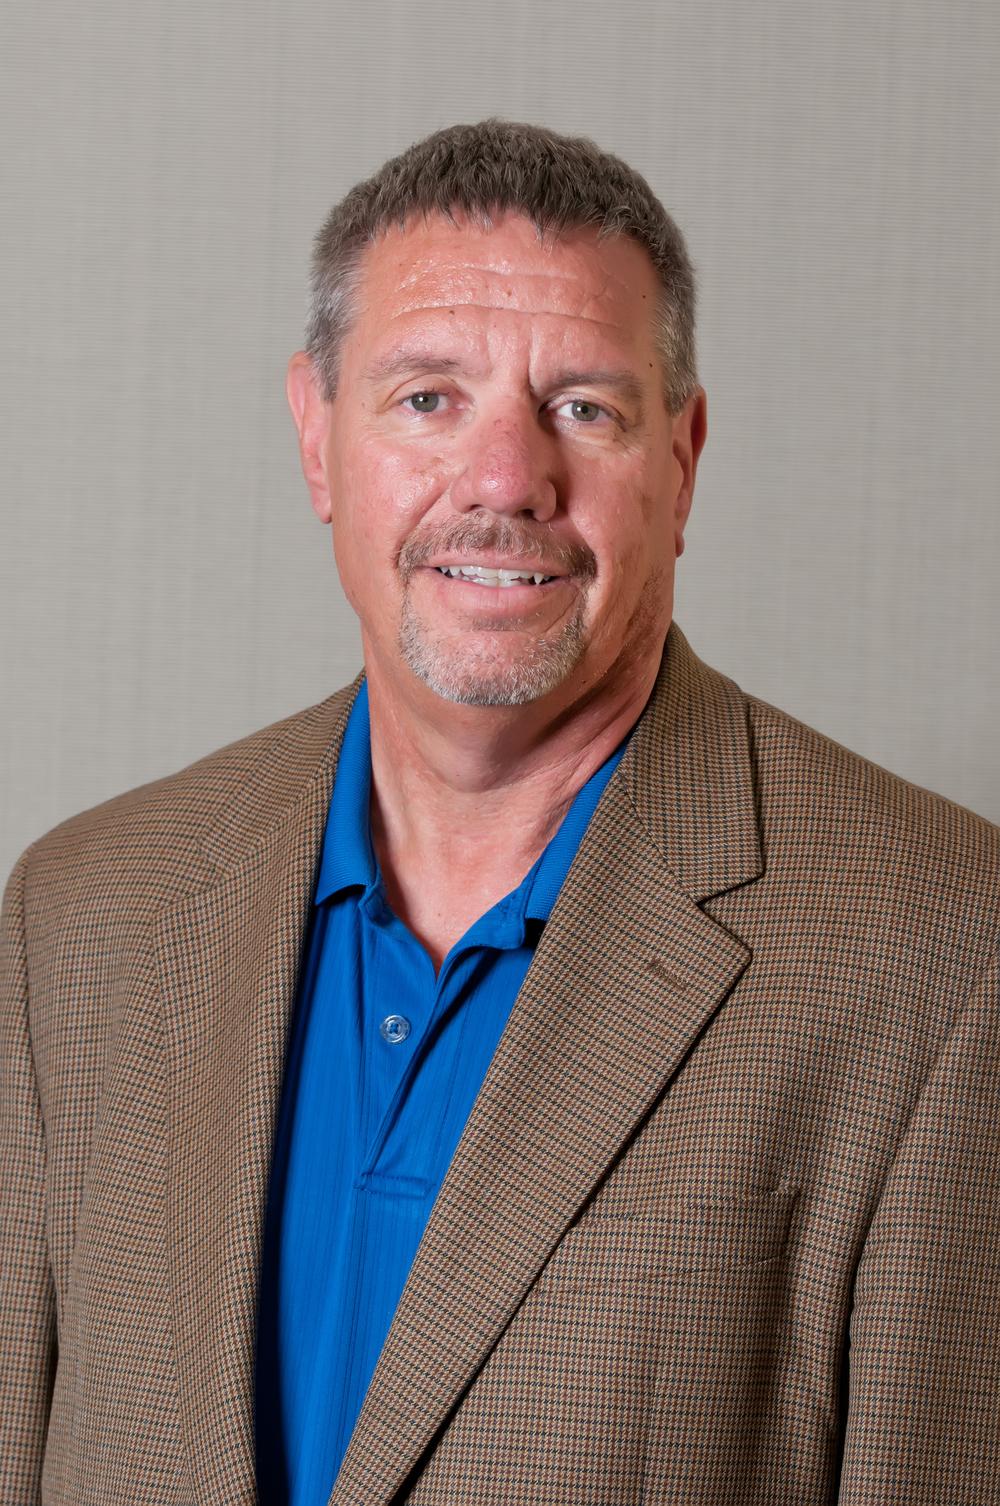 Steve Mathews  Mr. Mathews is the director of bands at Rock Bridge High School. To contact Mr. Mathews, email SMathews@CPSk12.org or cal the school at 573-214-3100